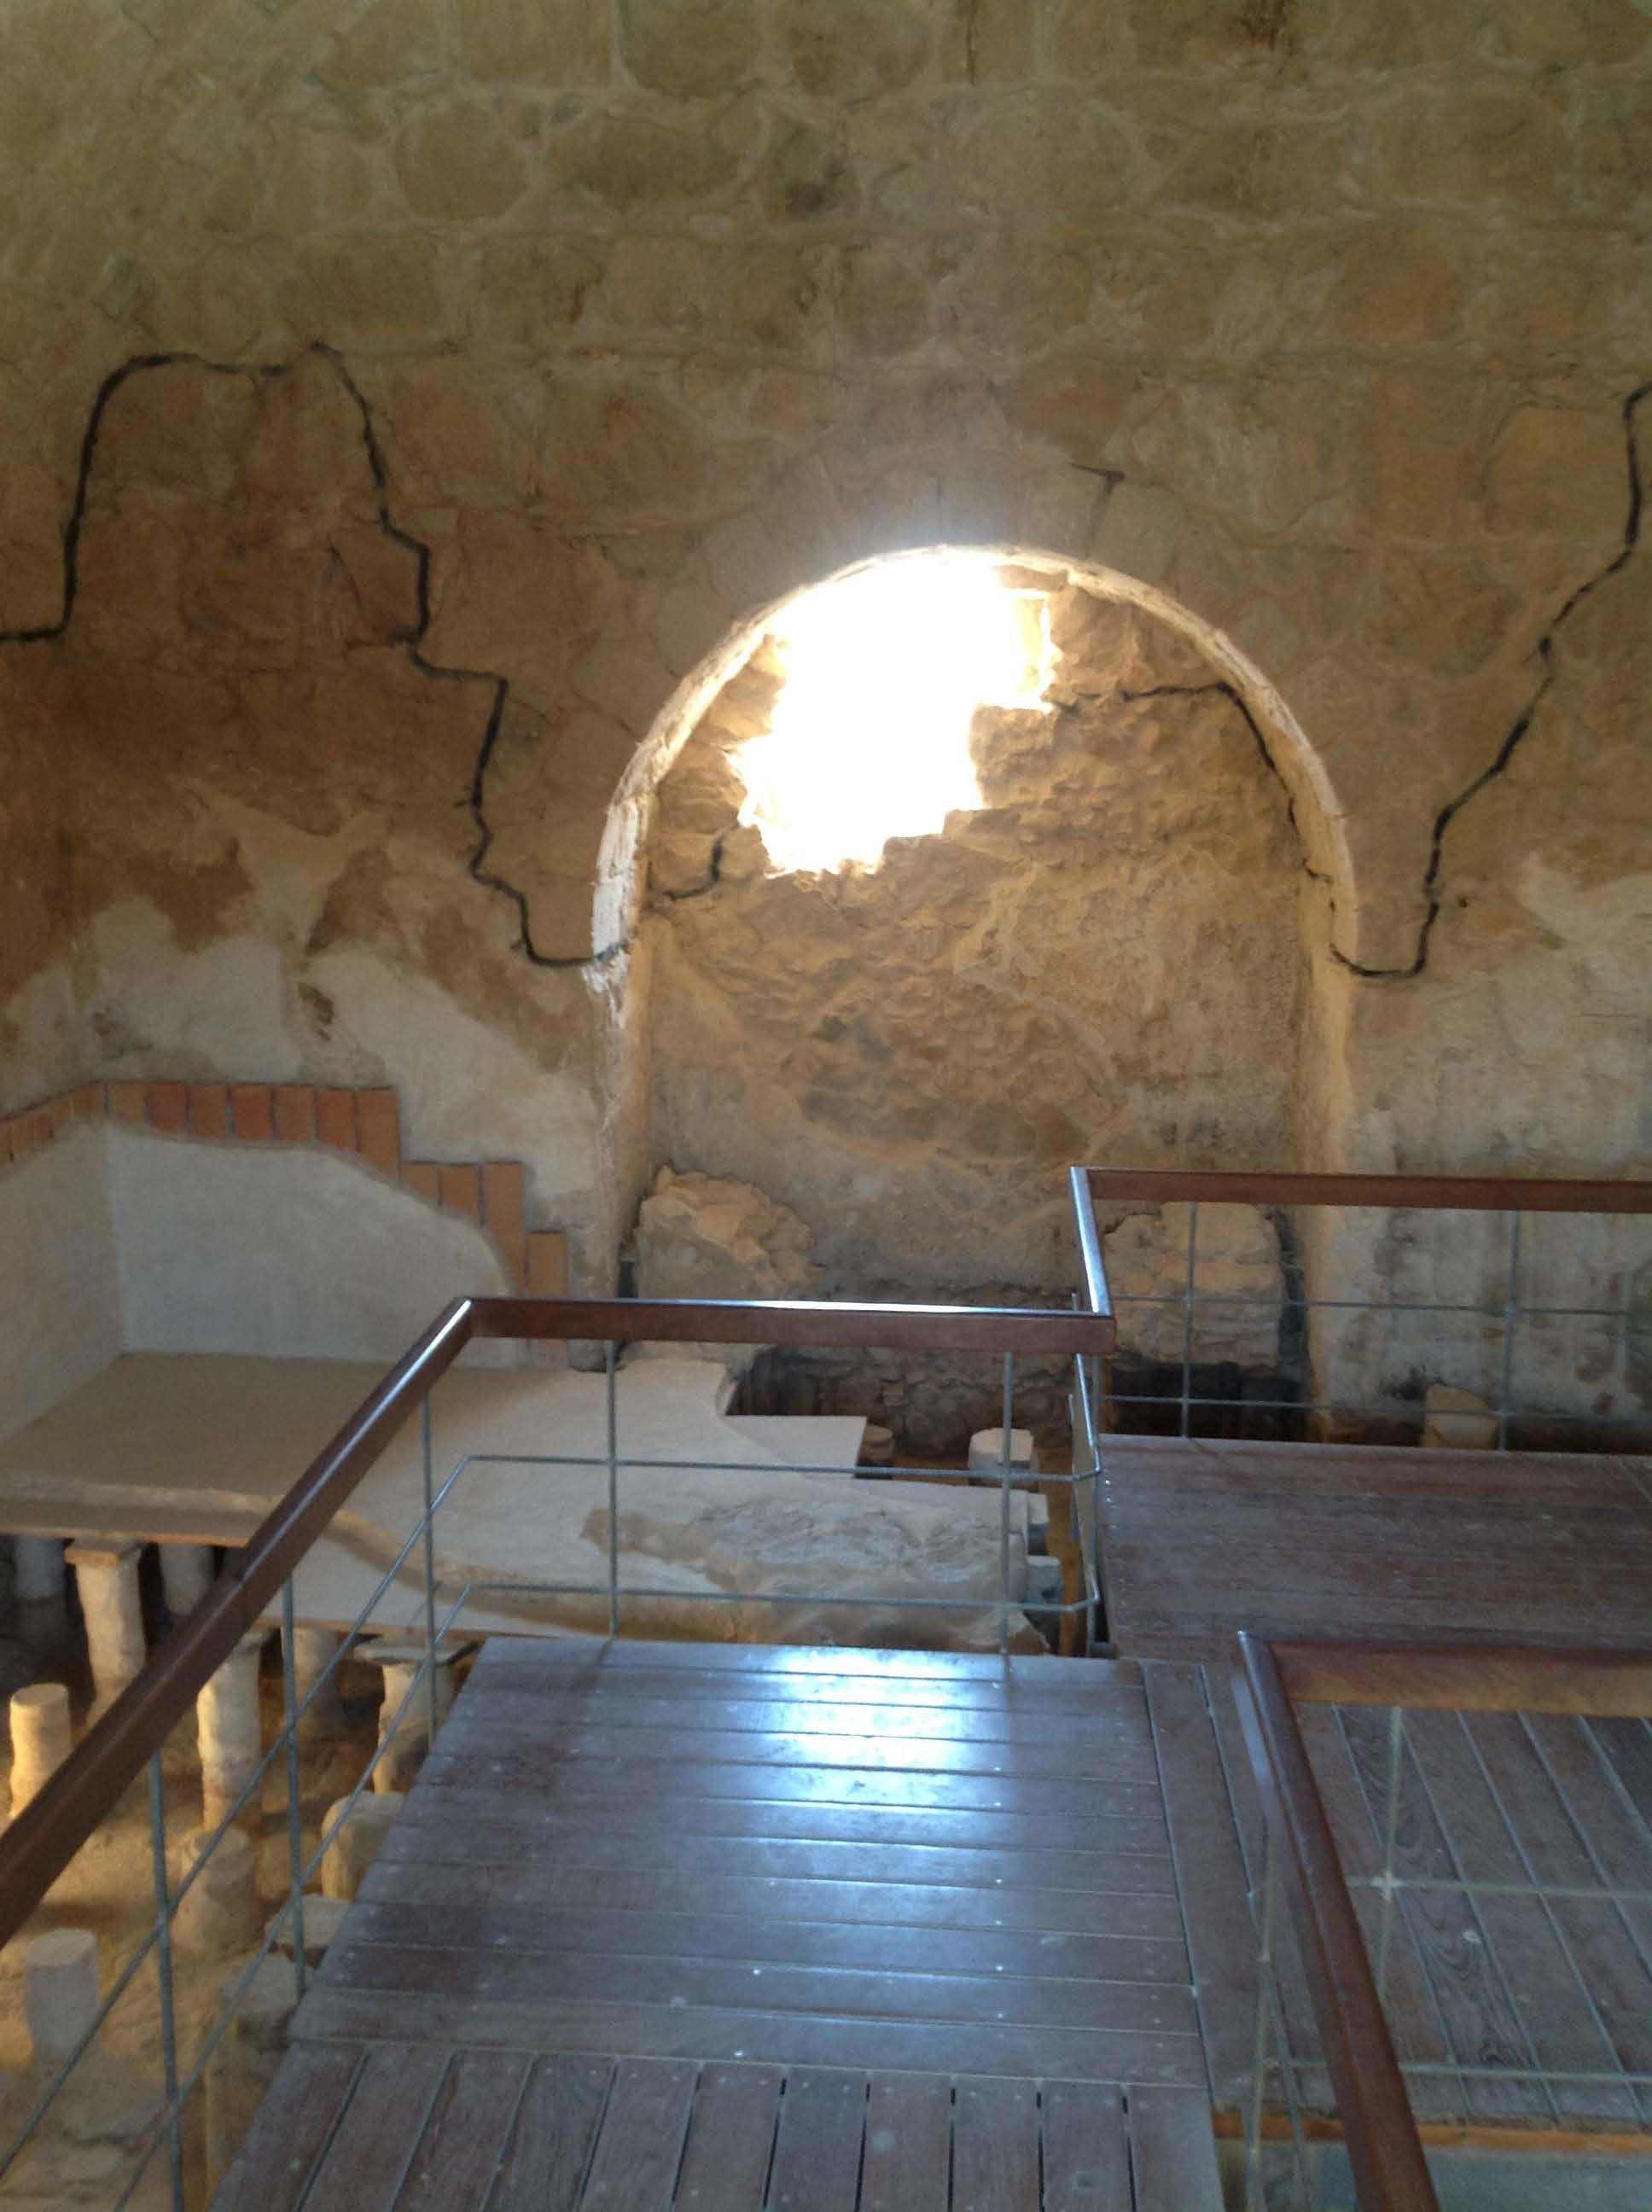 MASADA, ISRAEL - Inside of the Bathhouse of Masada